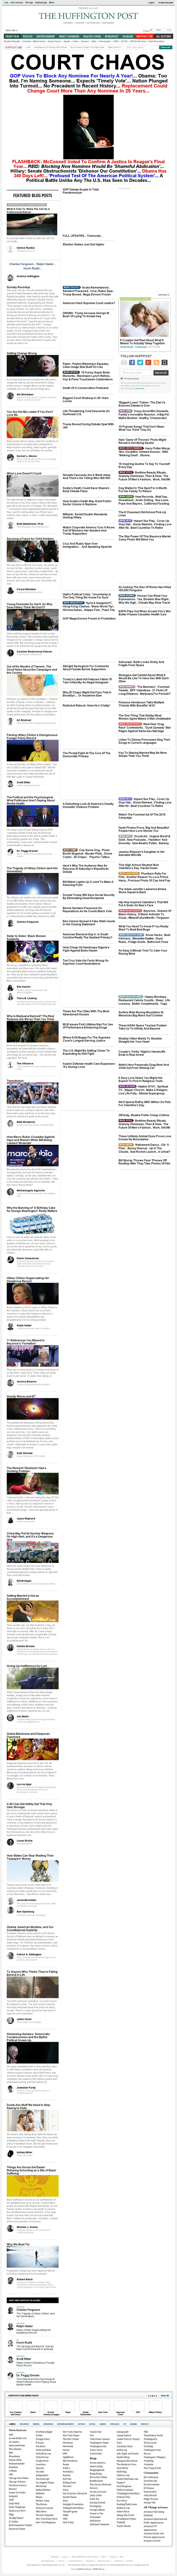 The Huffington Post at Sunday Feb. 14, 2016, 2:12 p.m. UTC